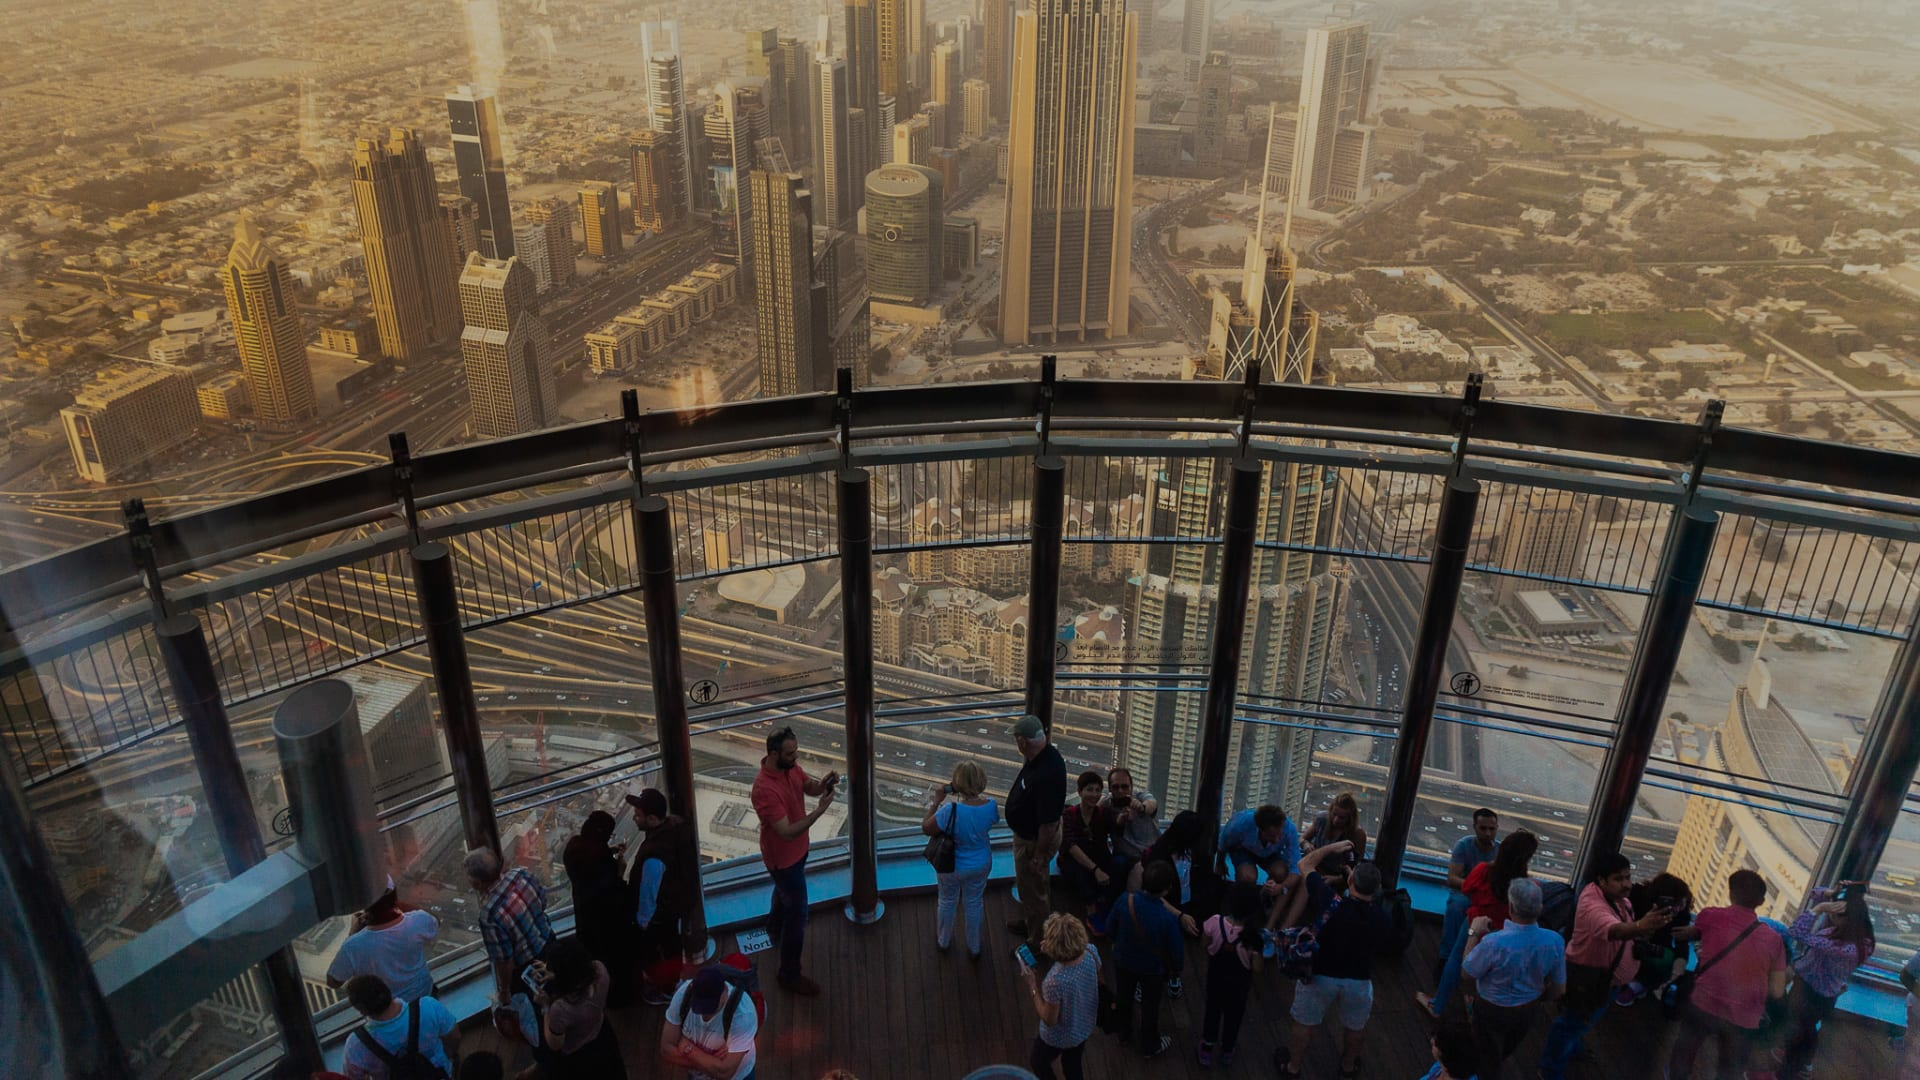 Skip the Line Burj Khalifa & Architectural Gems - Dubai